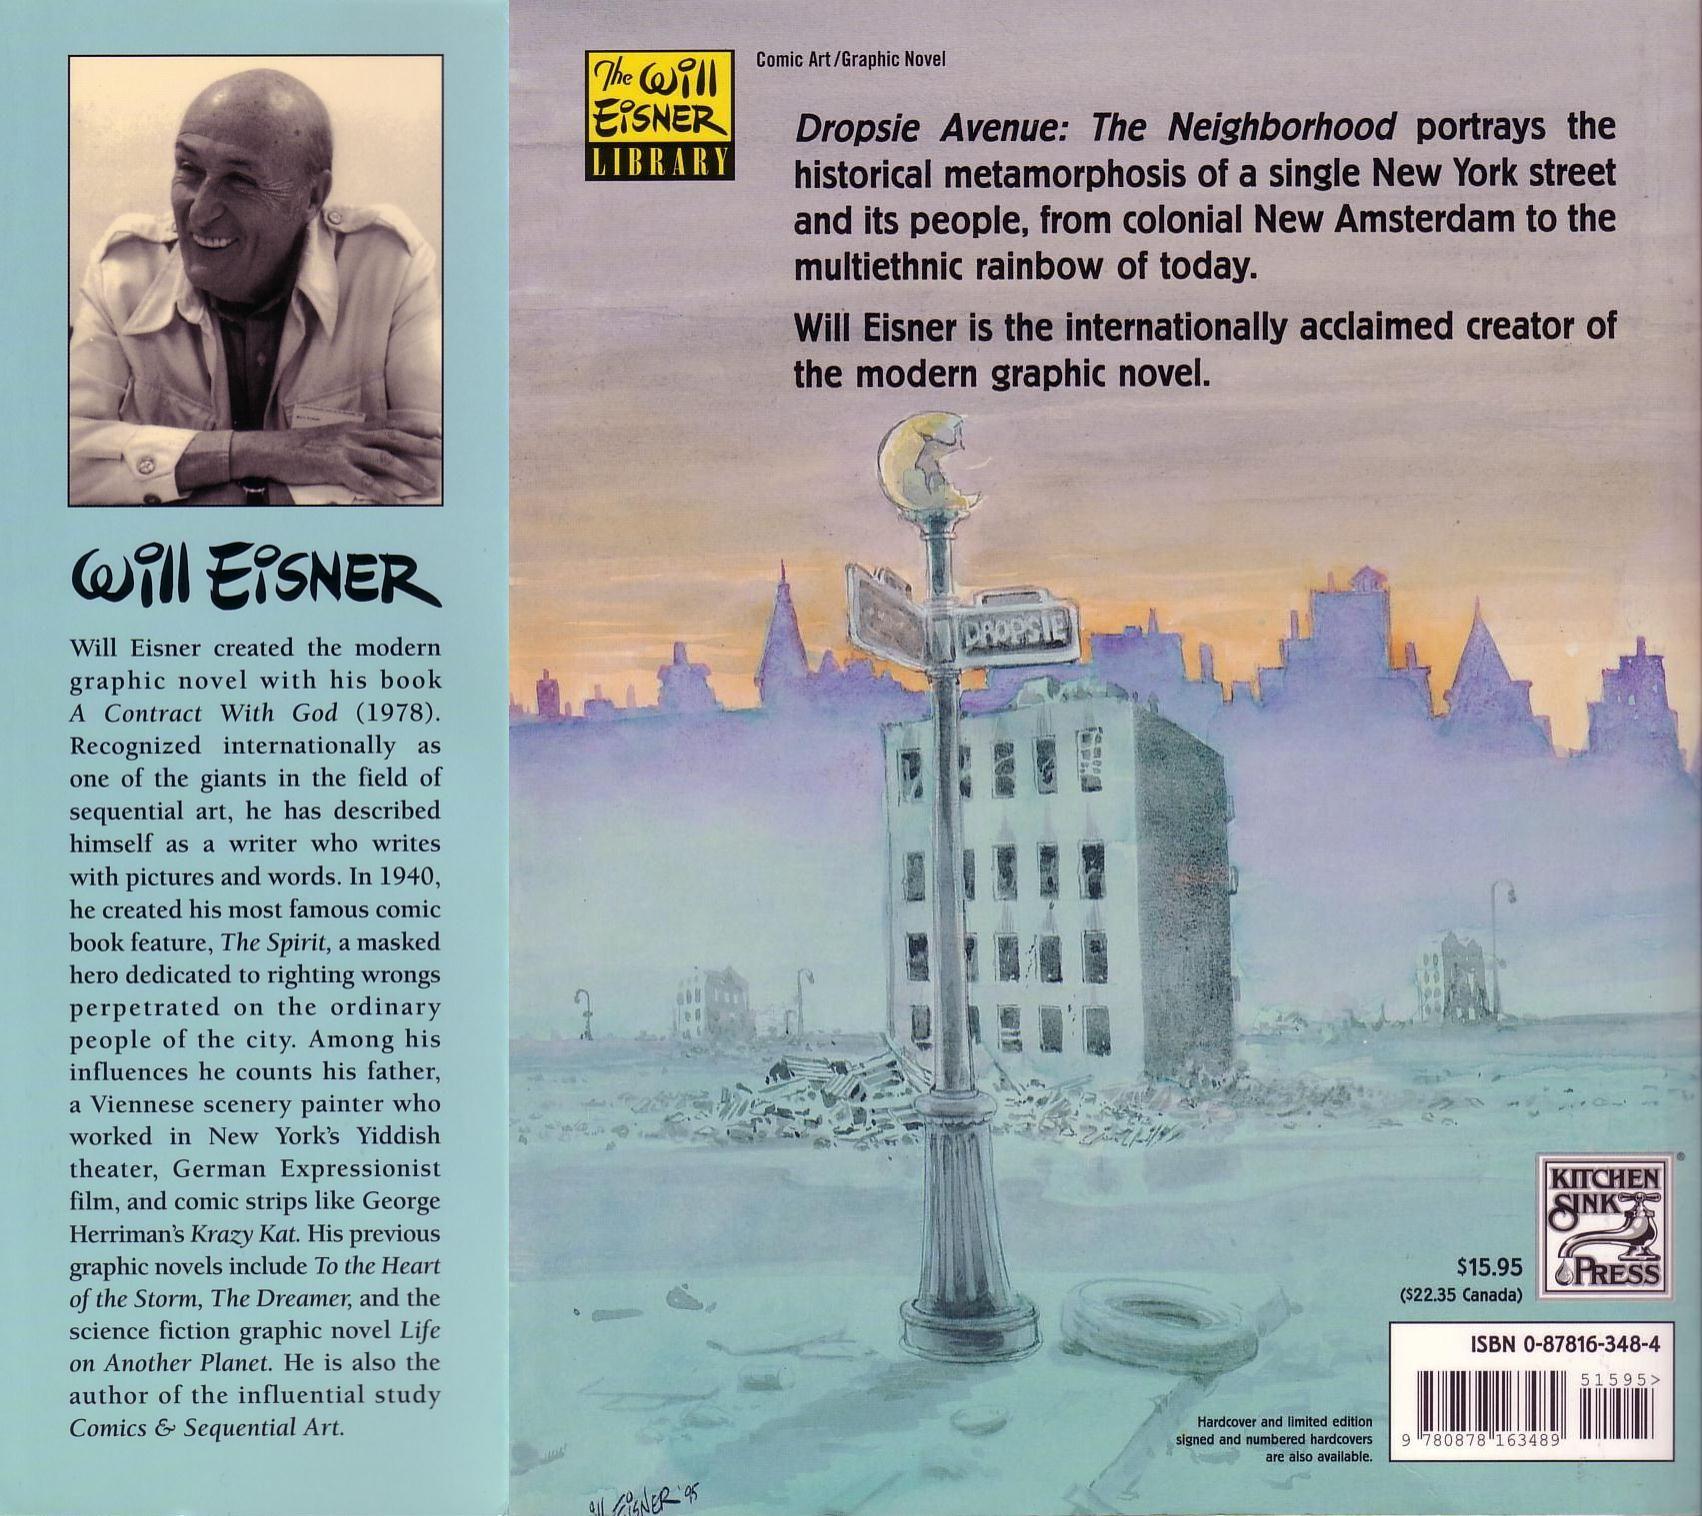 Read online Dropsie Avenue, The Neighborhood comic -  Issue # Full - 173